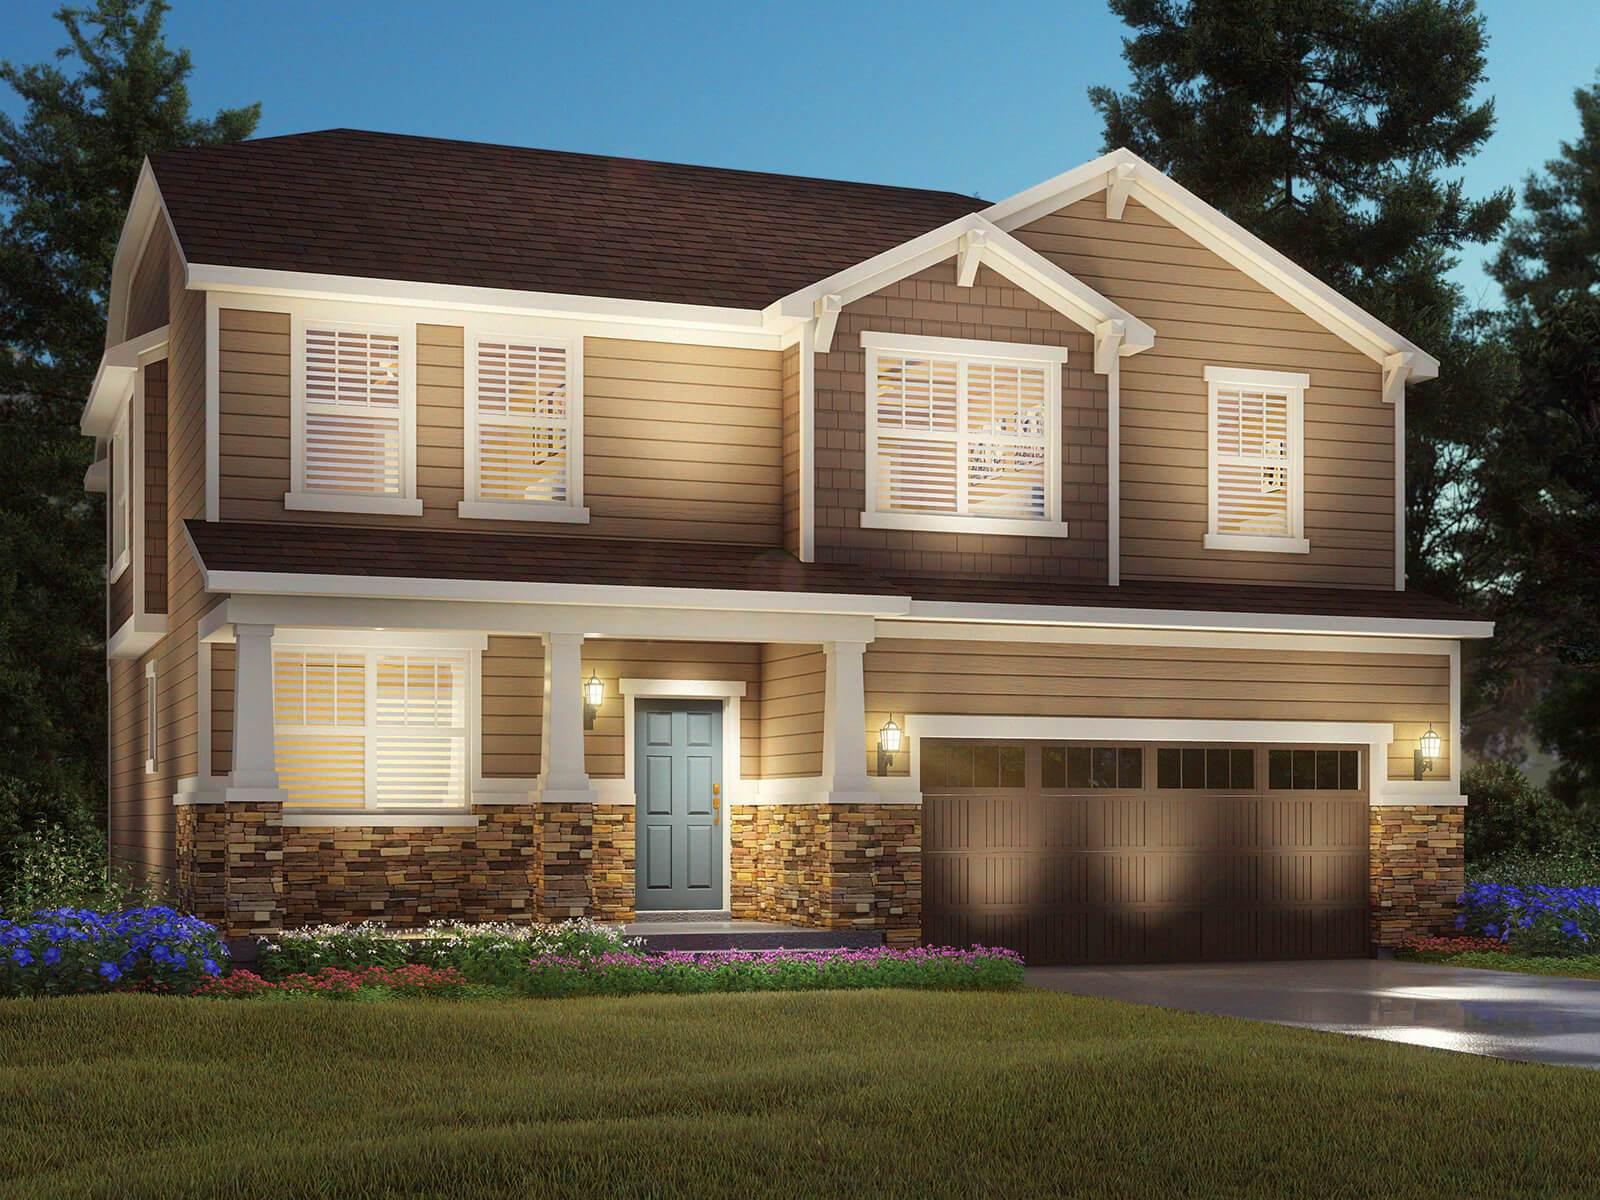 Longmont » Welcome Home Rebates